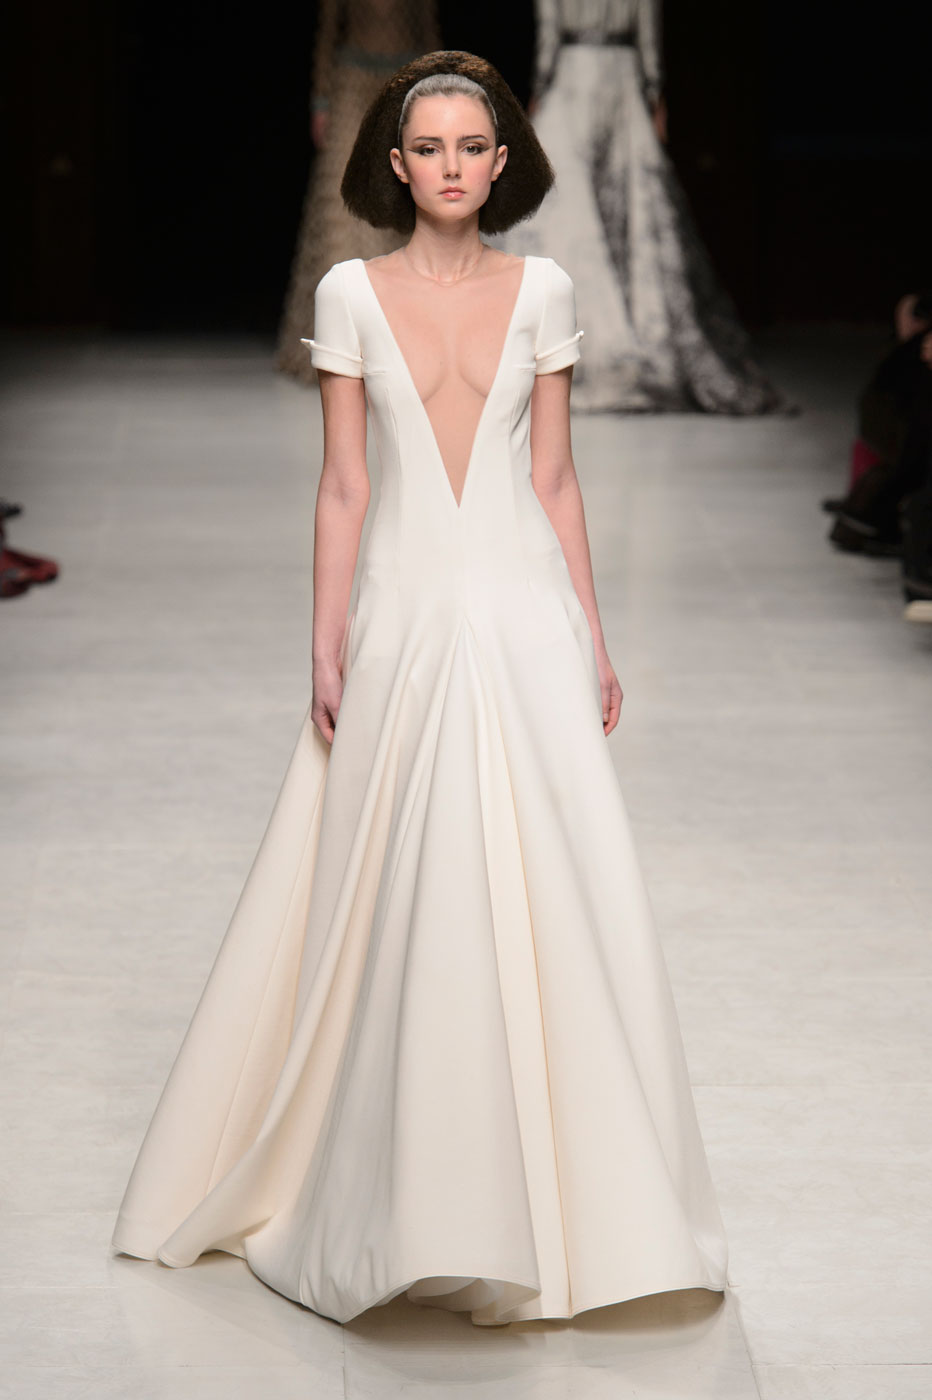 Julien-Fournie-Prive-fashion-runway-show-haute-couture-paris-spring-2015-the-impression-36